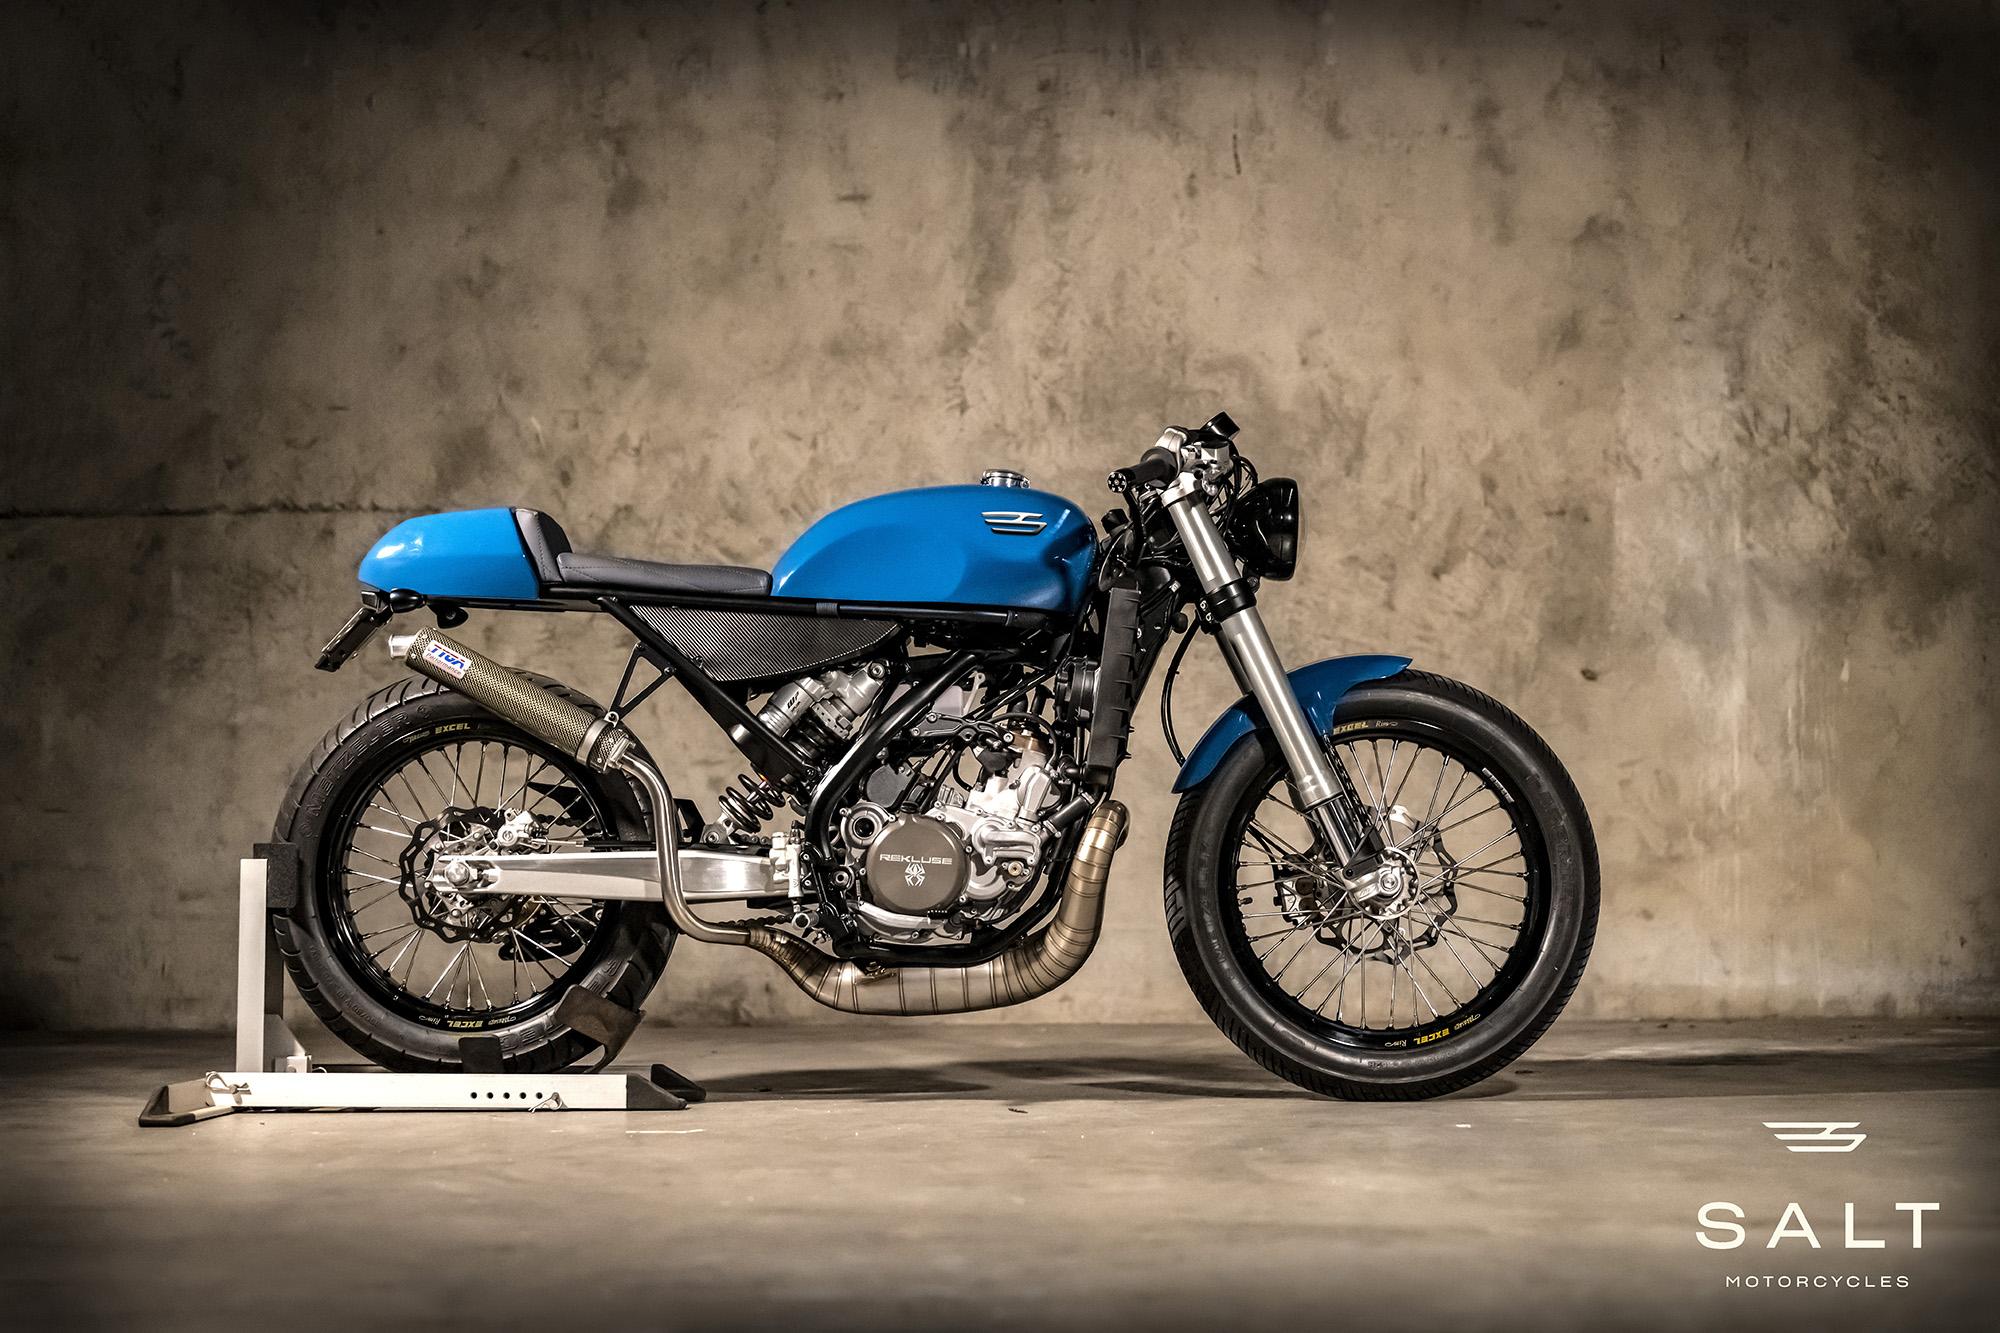 Salt two-stroke motorcycle